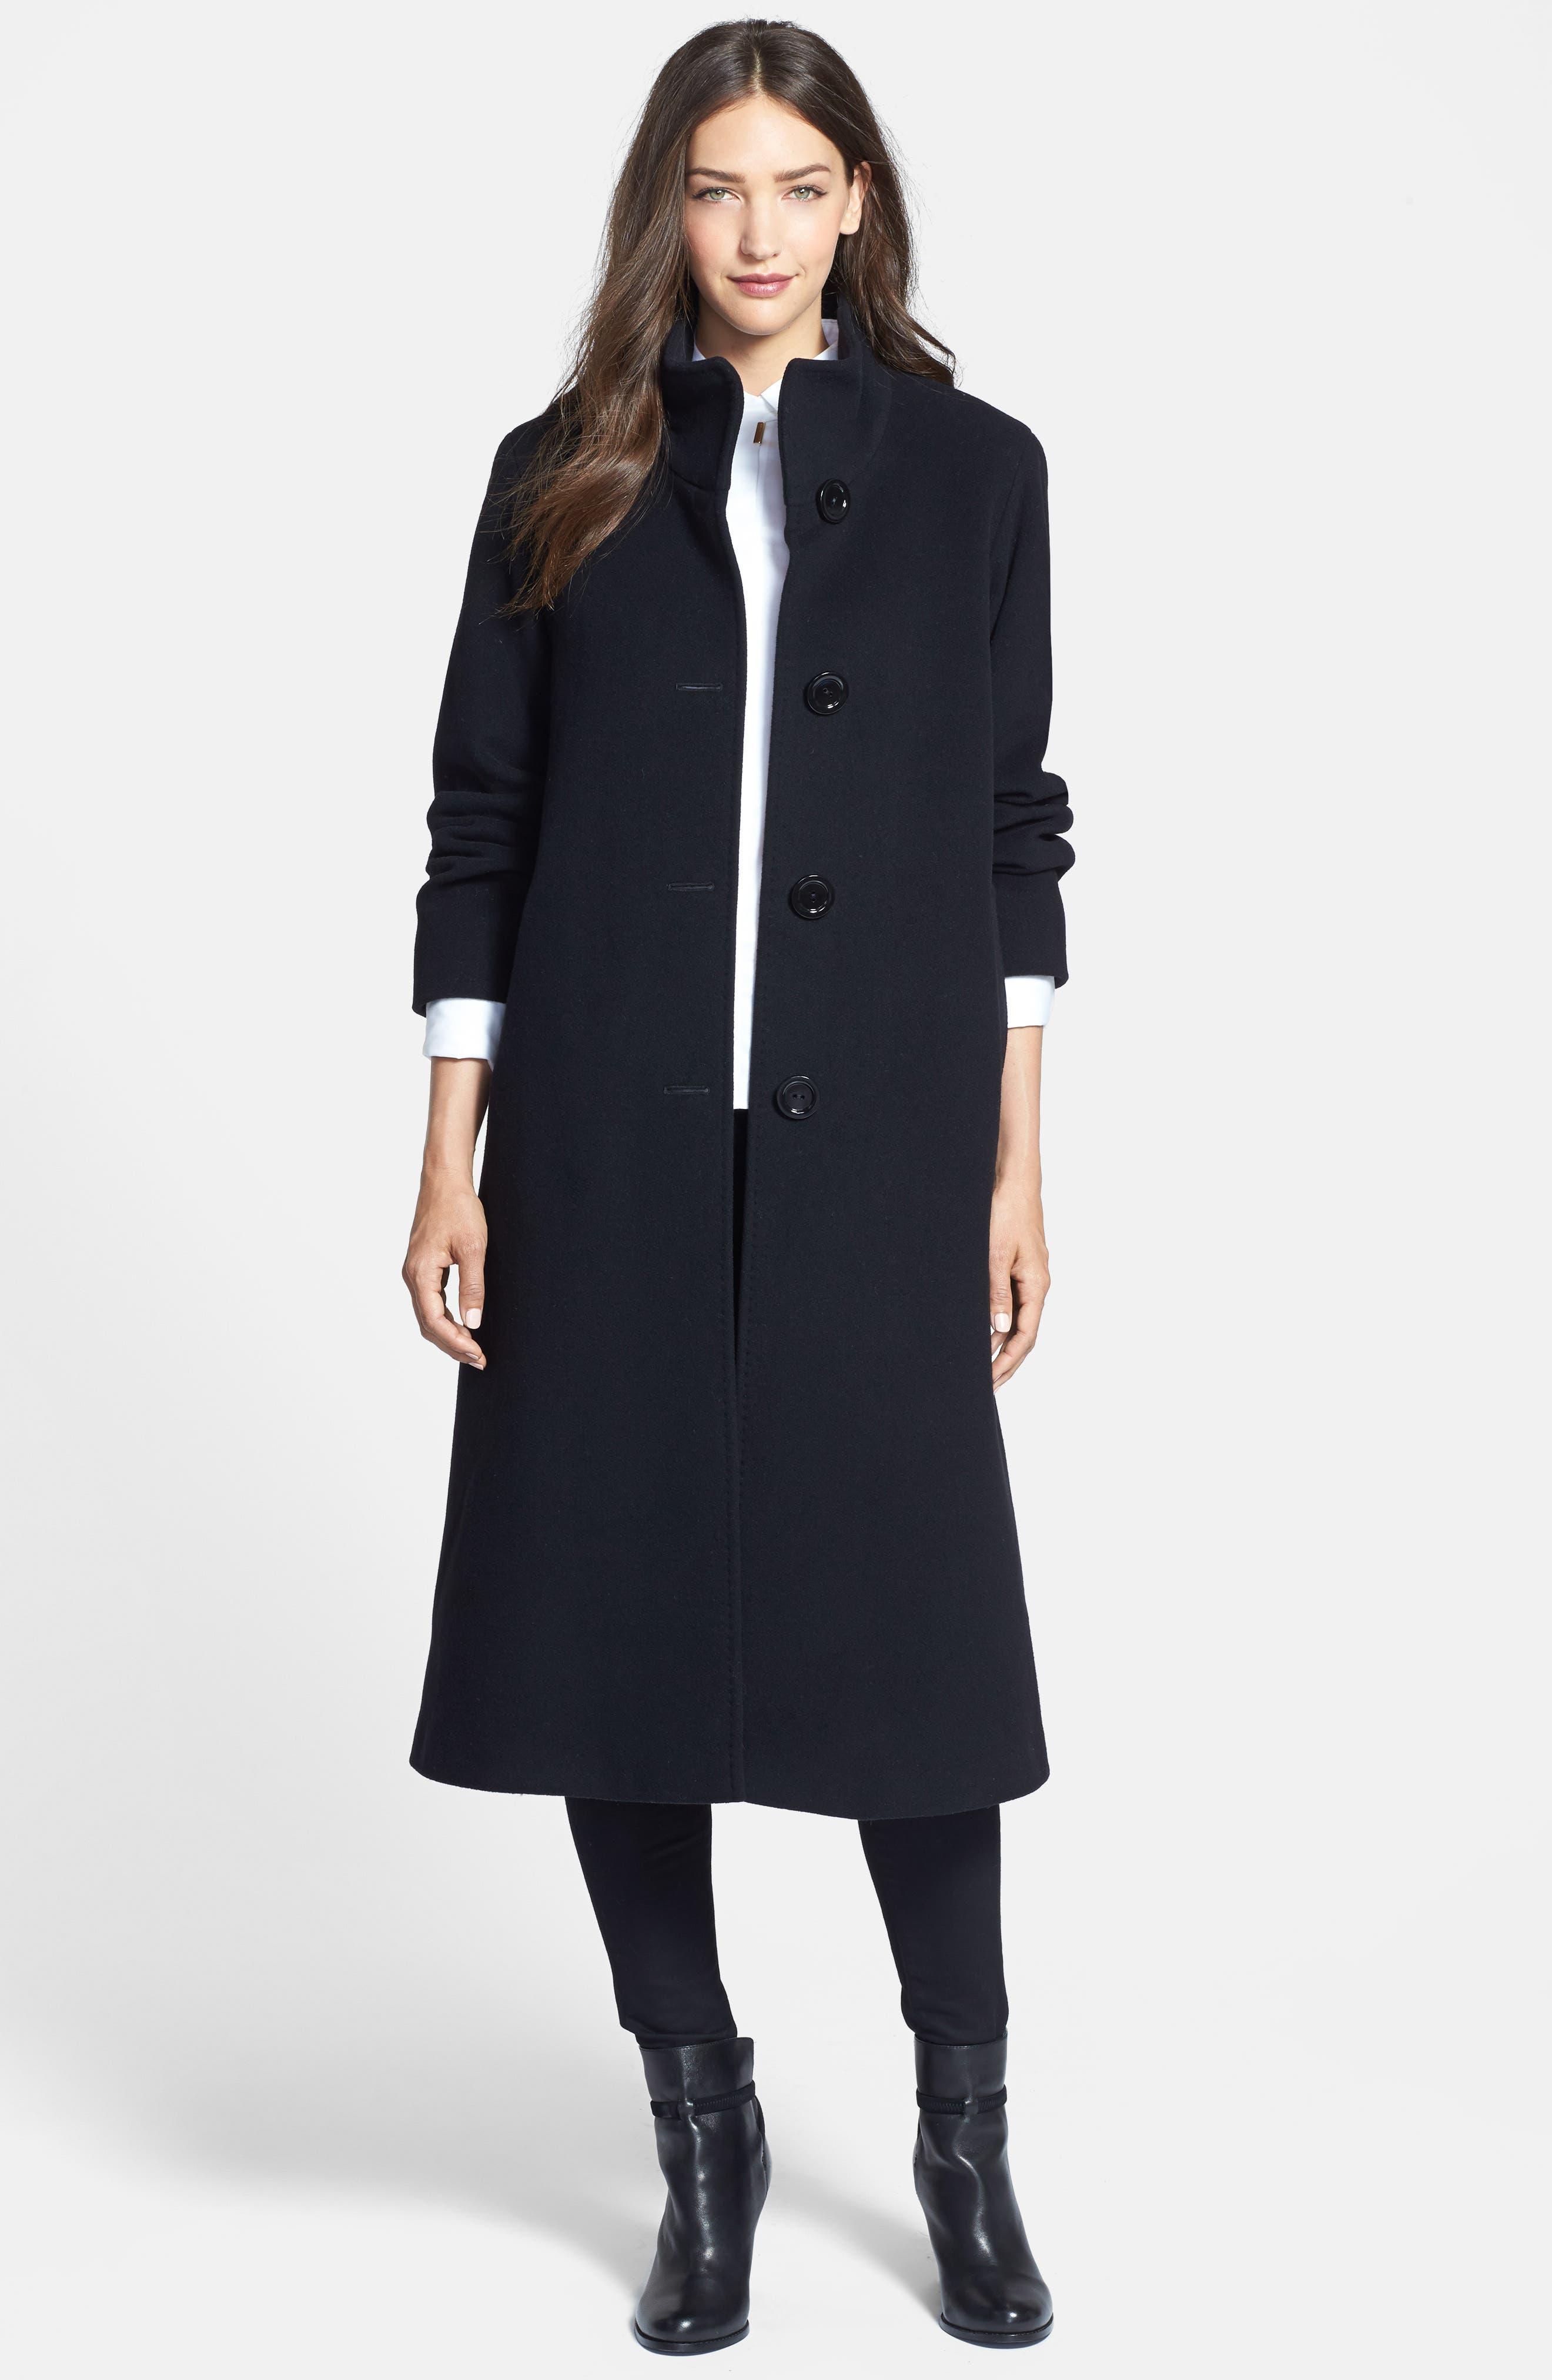 Cinzia Rocca DUE Stand Collar Side Slit Long Coat (Regular & Petite)